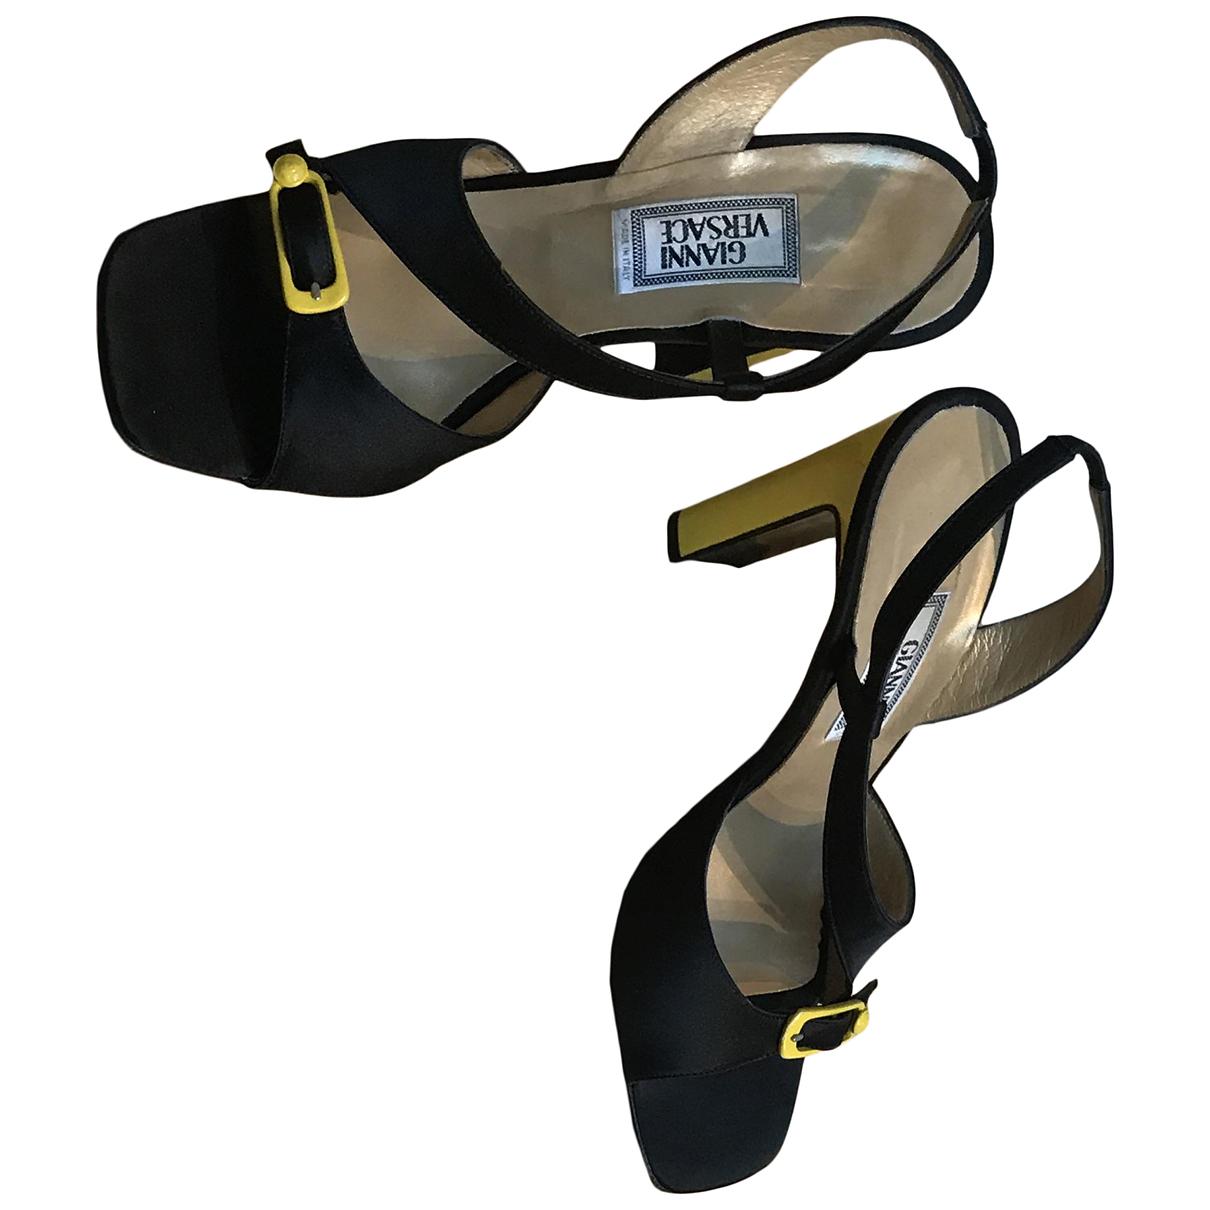 Gianni Versace N Multicolour Cloth Heels for Women 37 EU